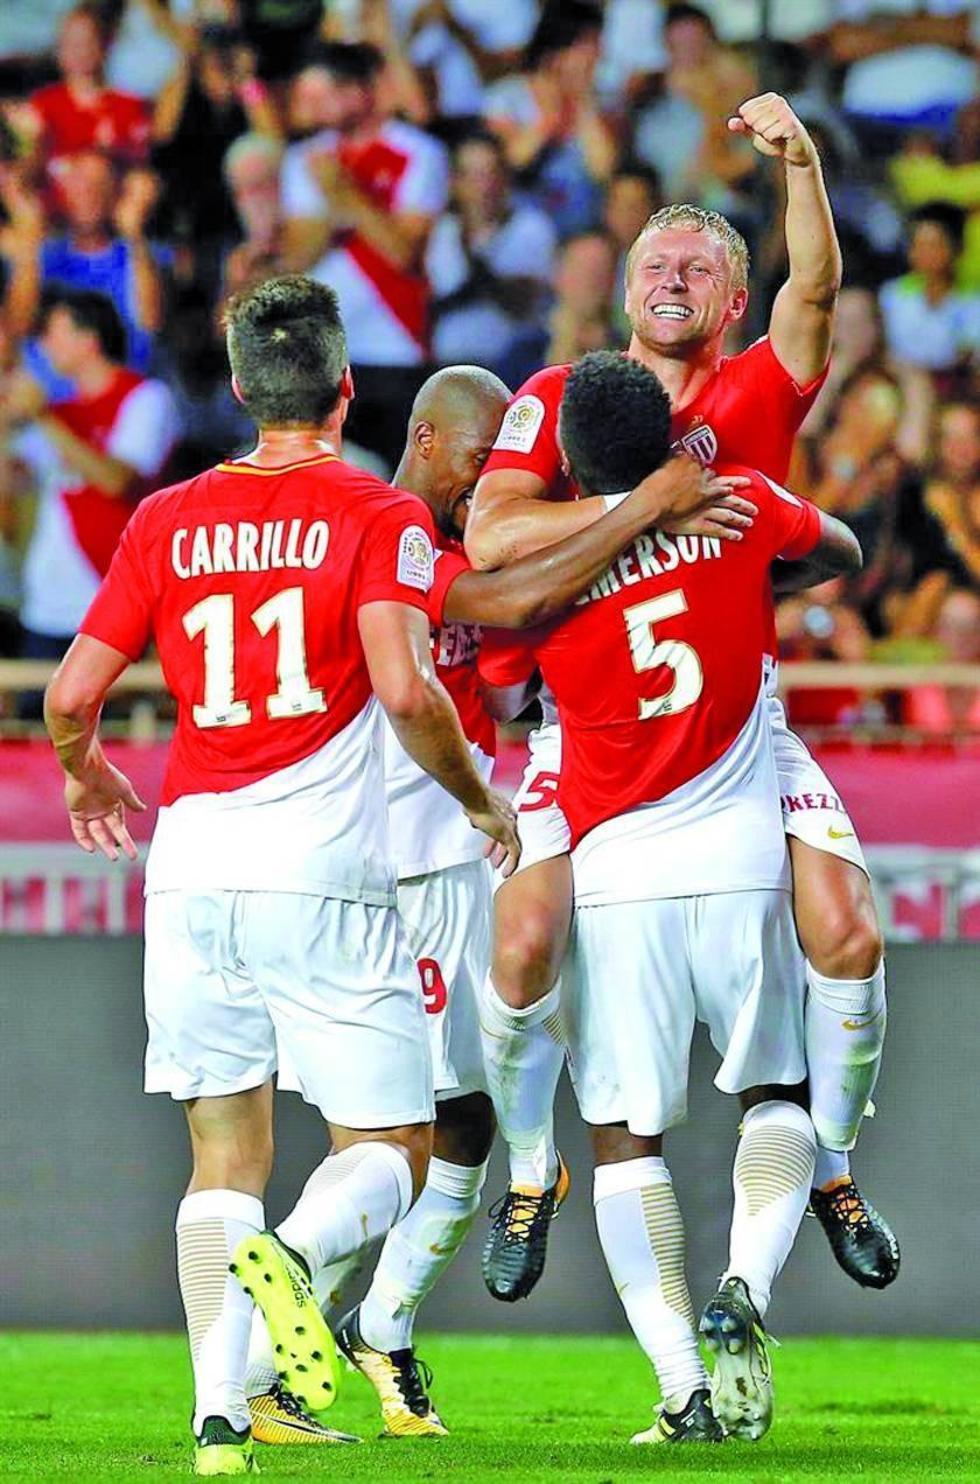 Mónaco inicia defensa de título con triunfo